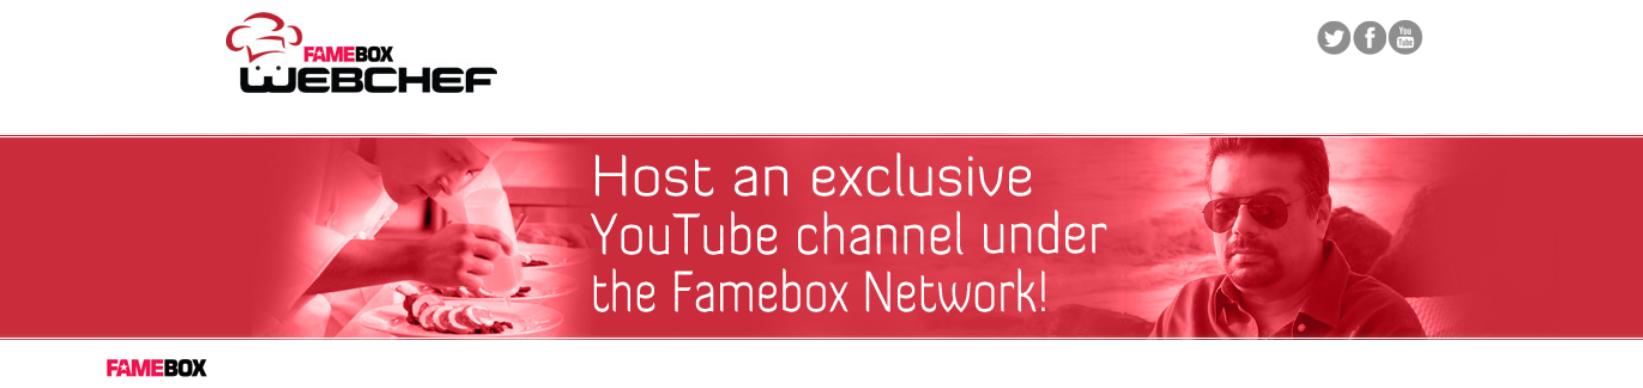 Famebox WebChef